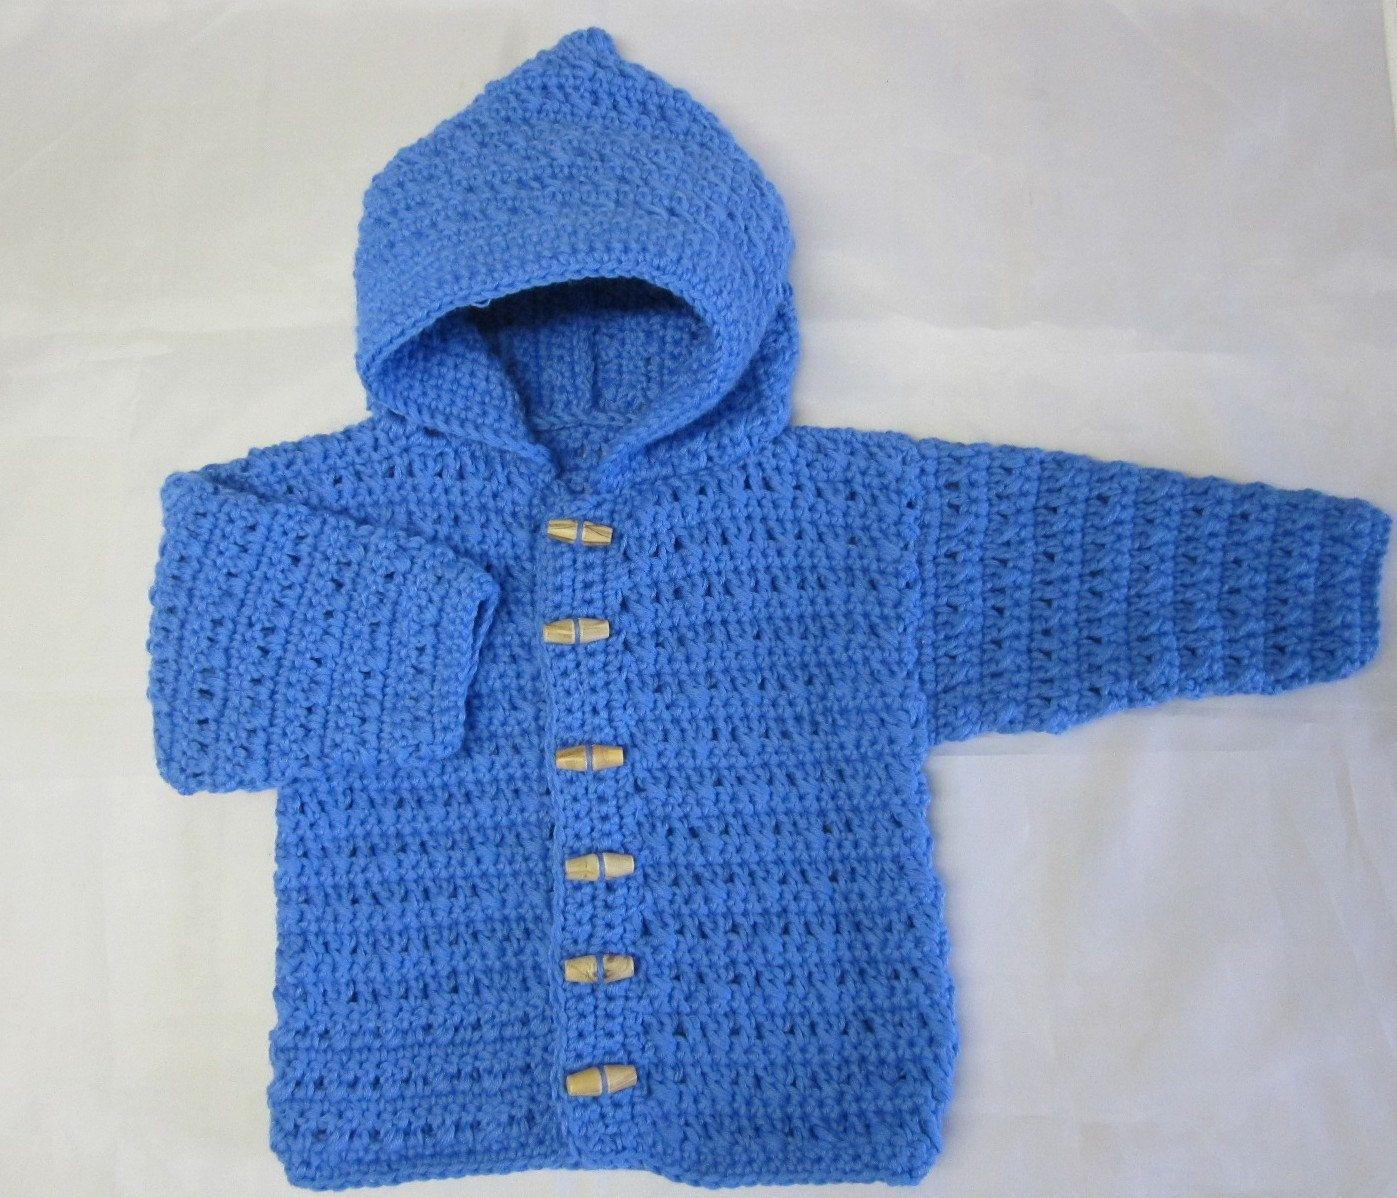 Crochet Baby Boy Sweater 5392 Wallpapers